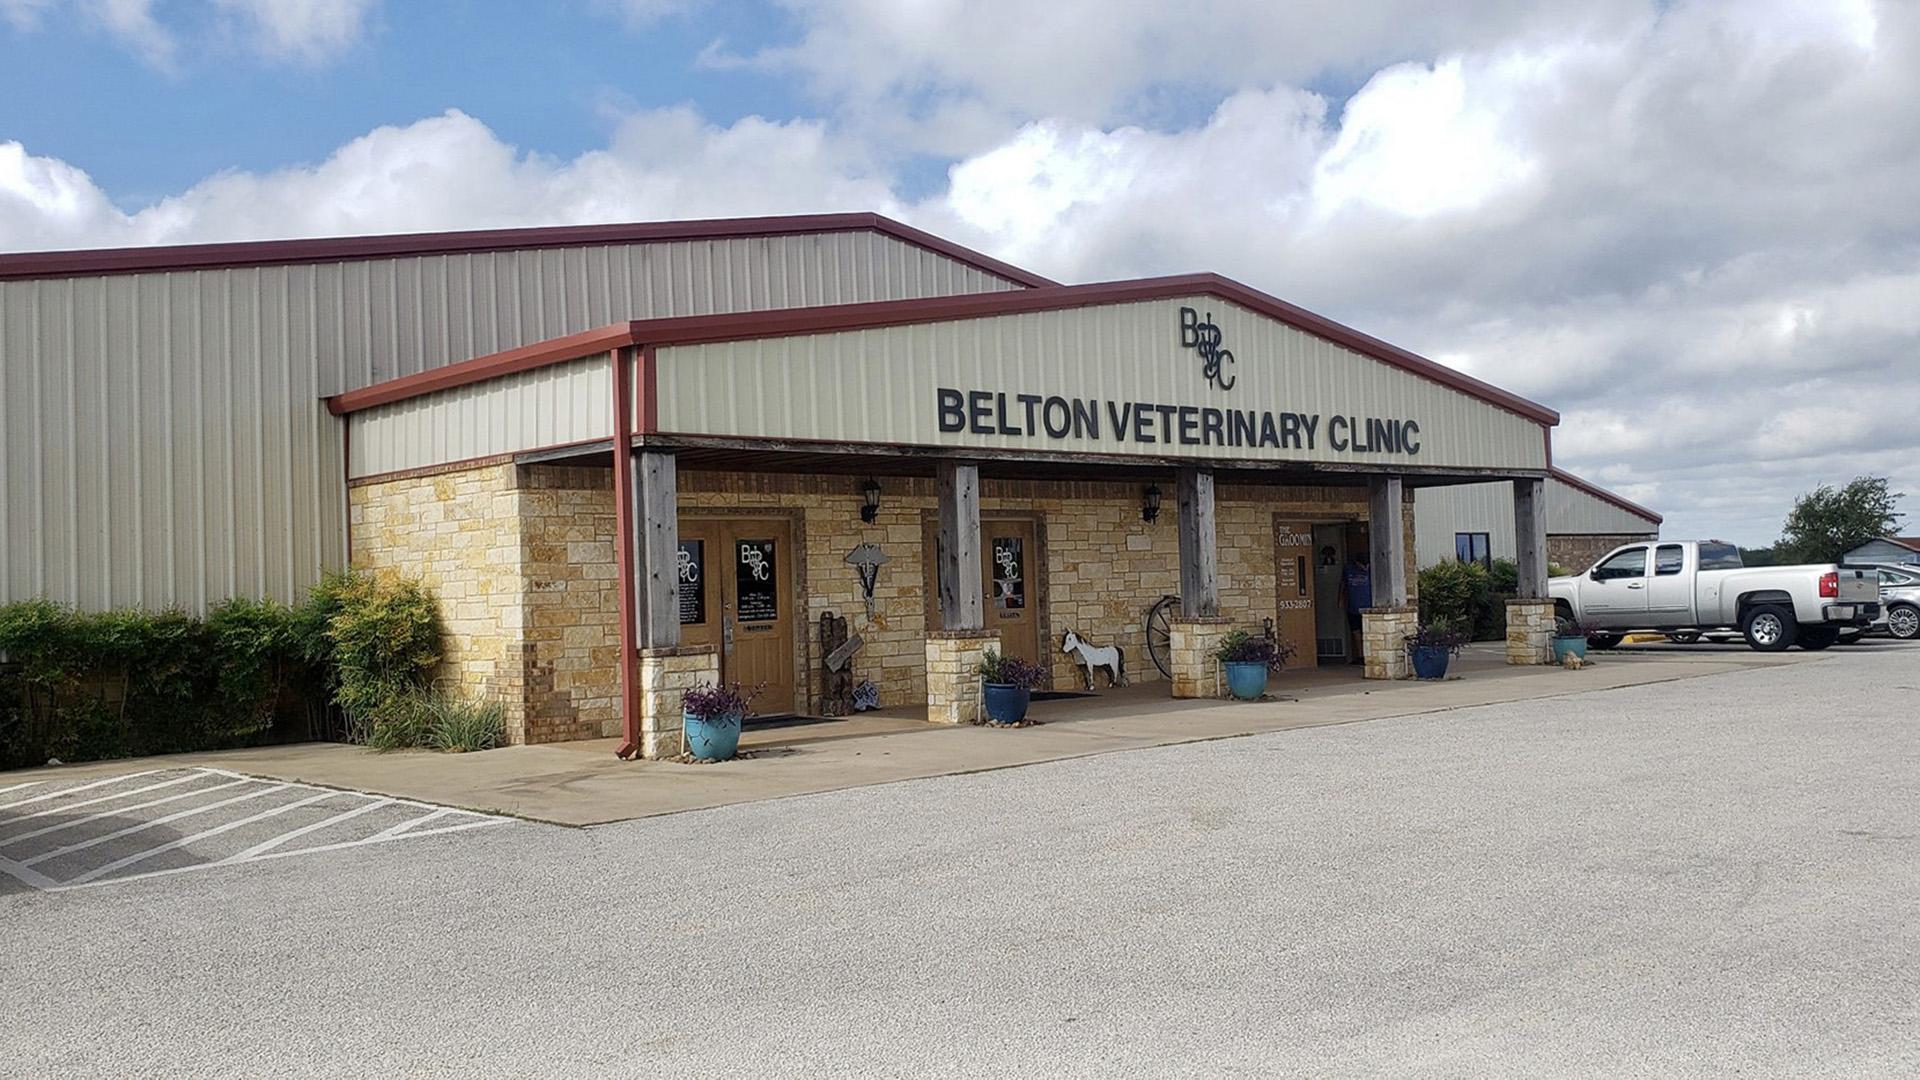 Belton Veterinary Clinic customer